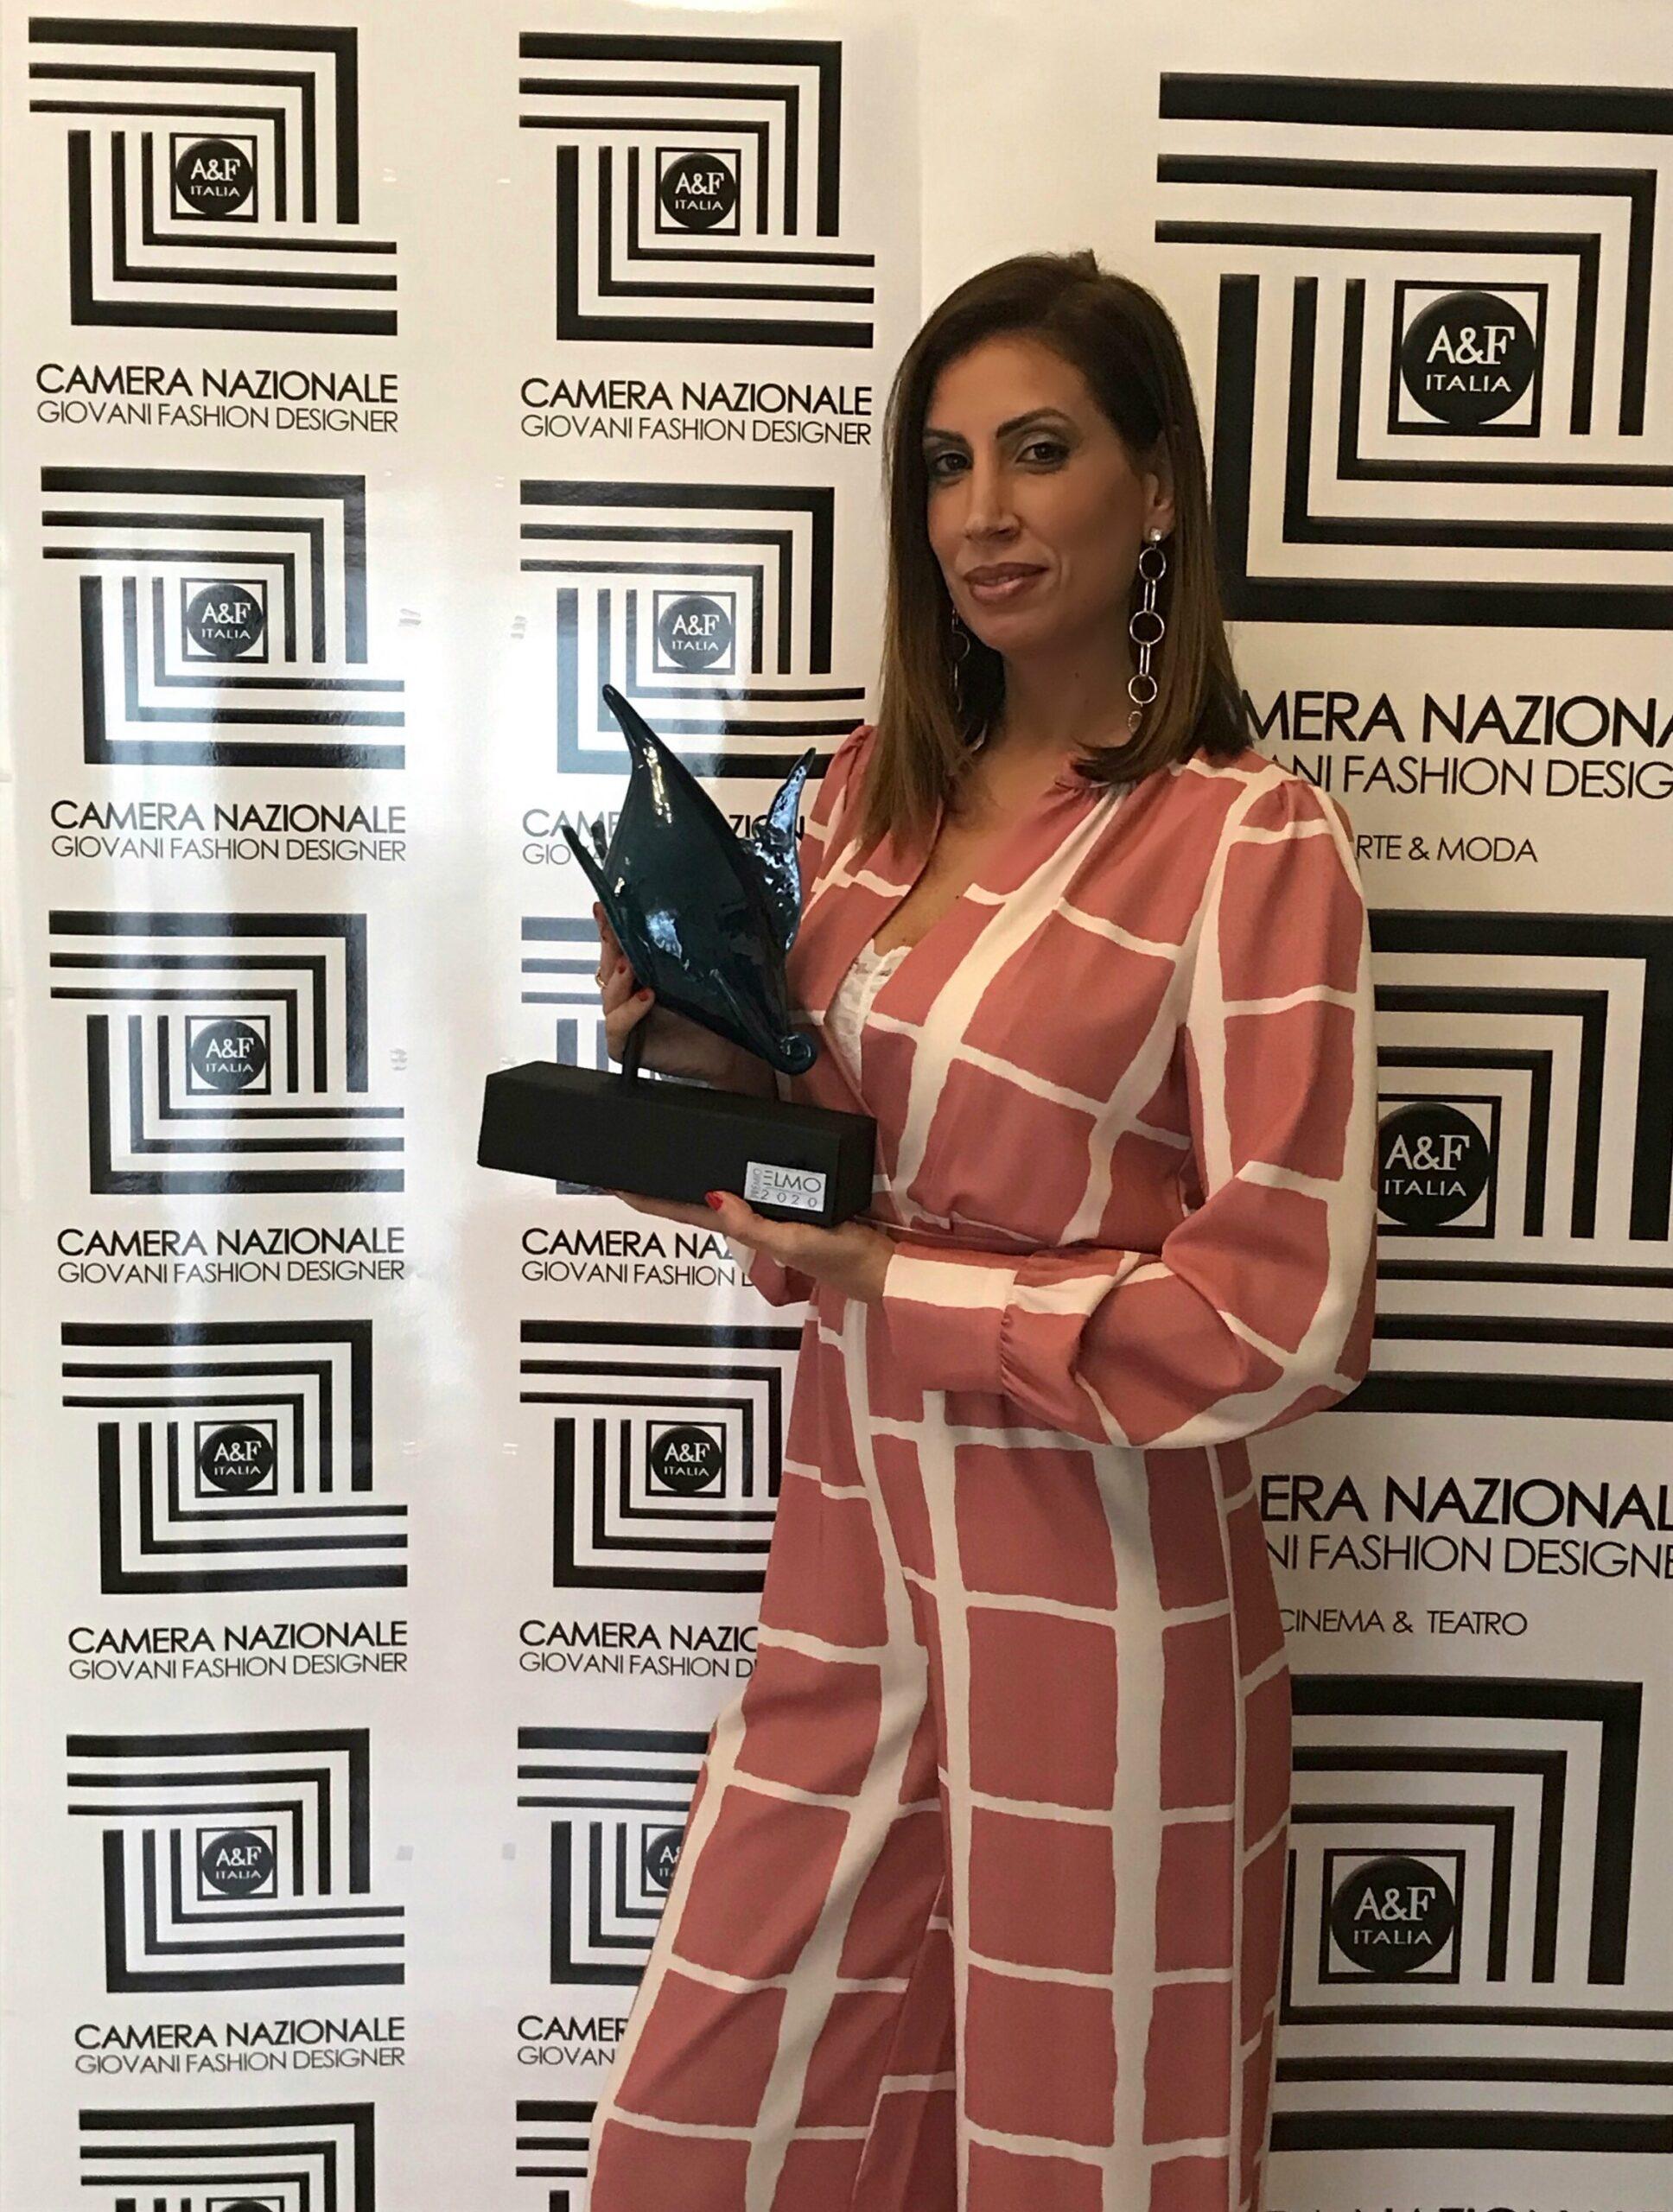 La presidente Alessandra Giulivo riceve il premio Elmo 2020